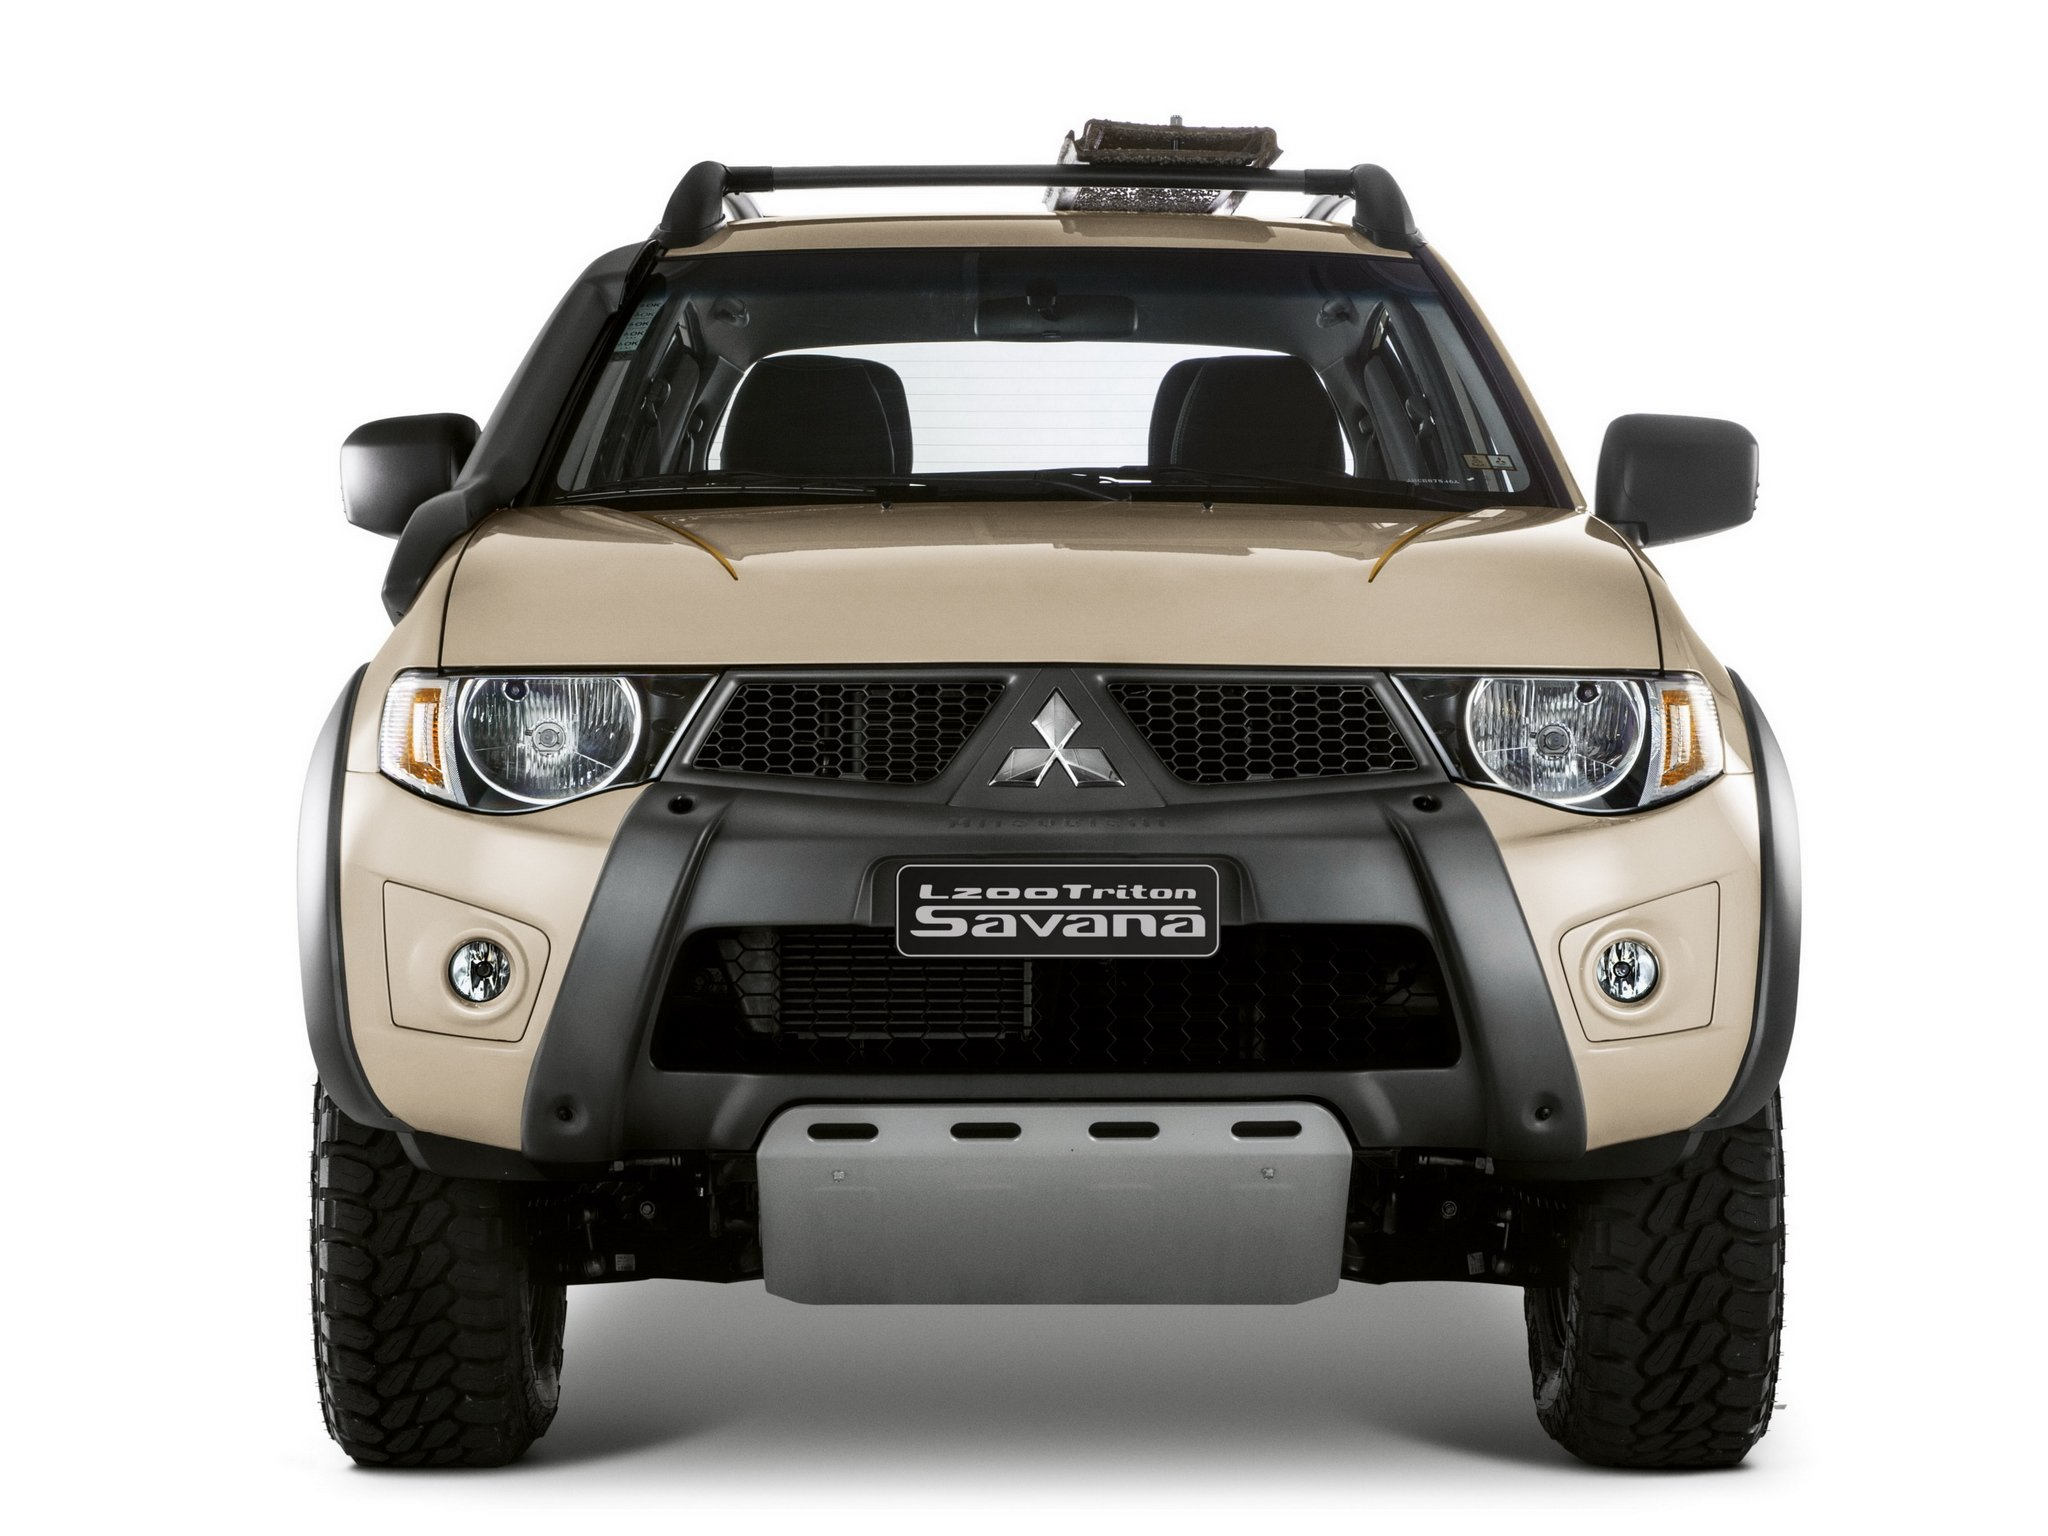 2014 Mitsubishi L200 Triton Savana pickup e wallpaper | 2048x1536